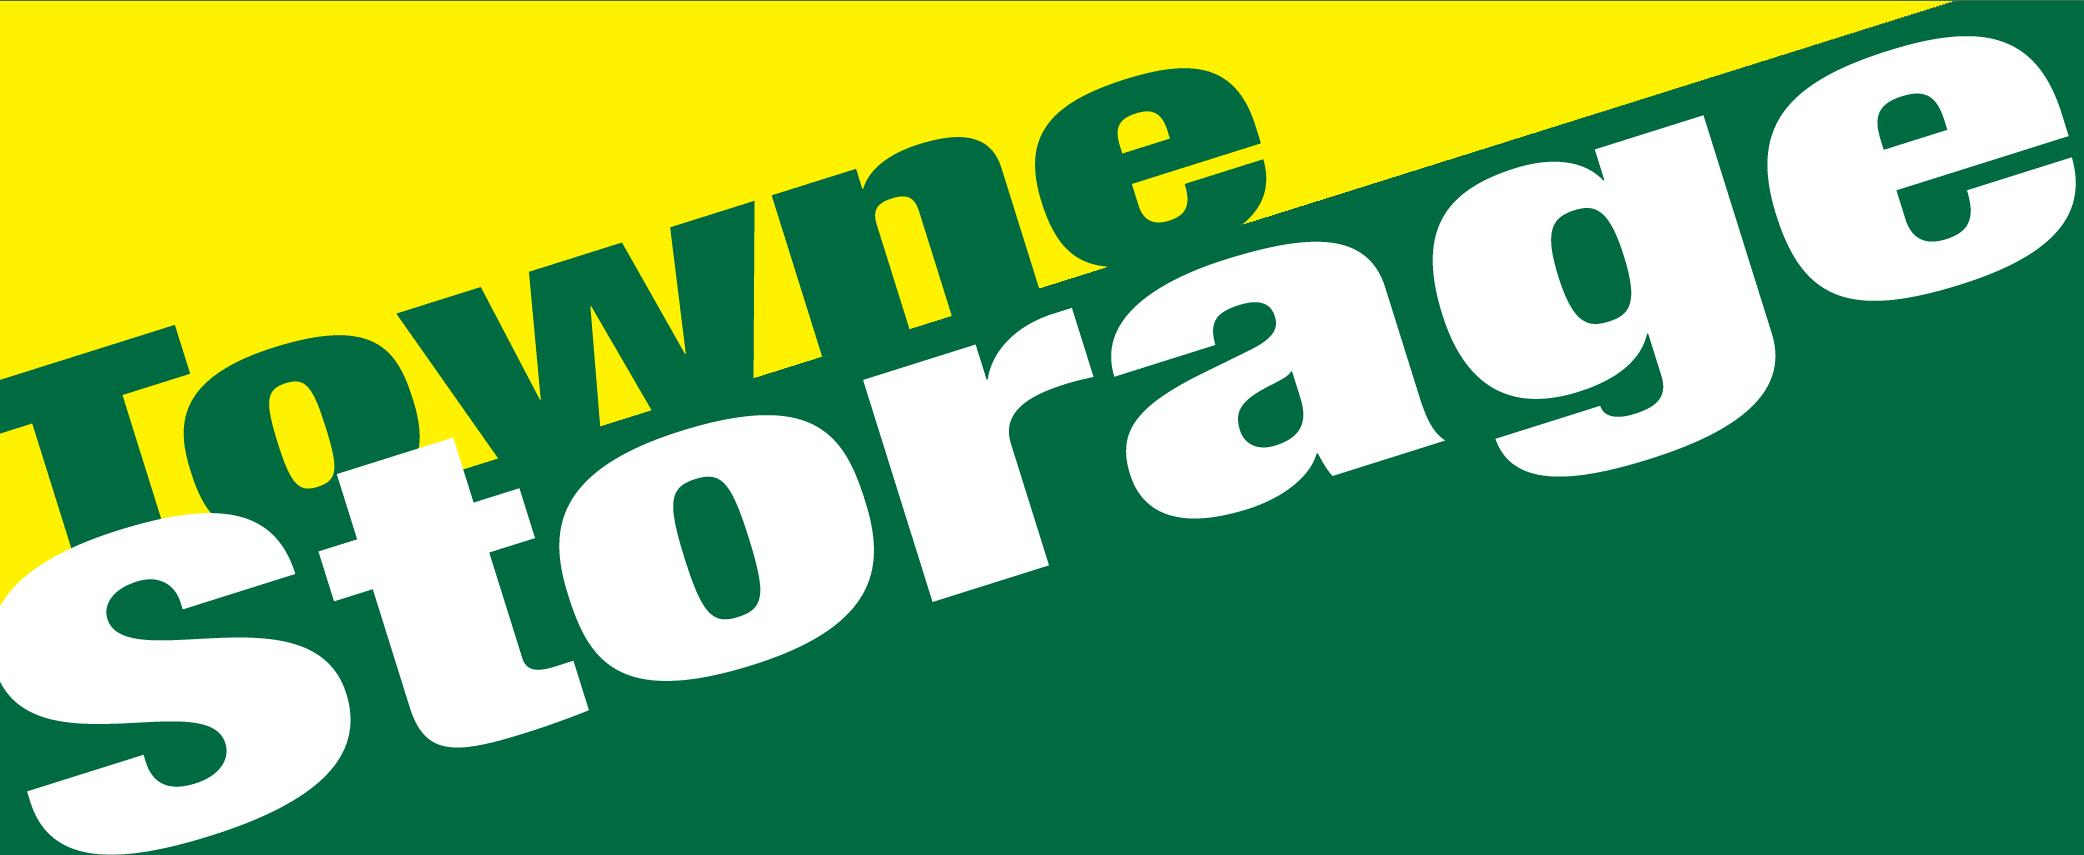 Towne Storage - Saratoga logo